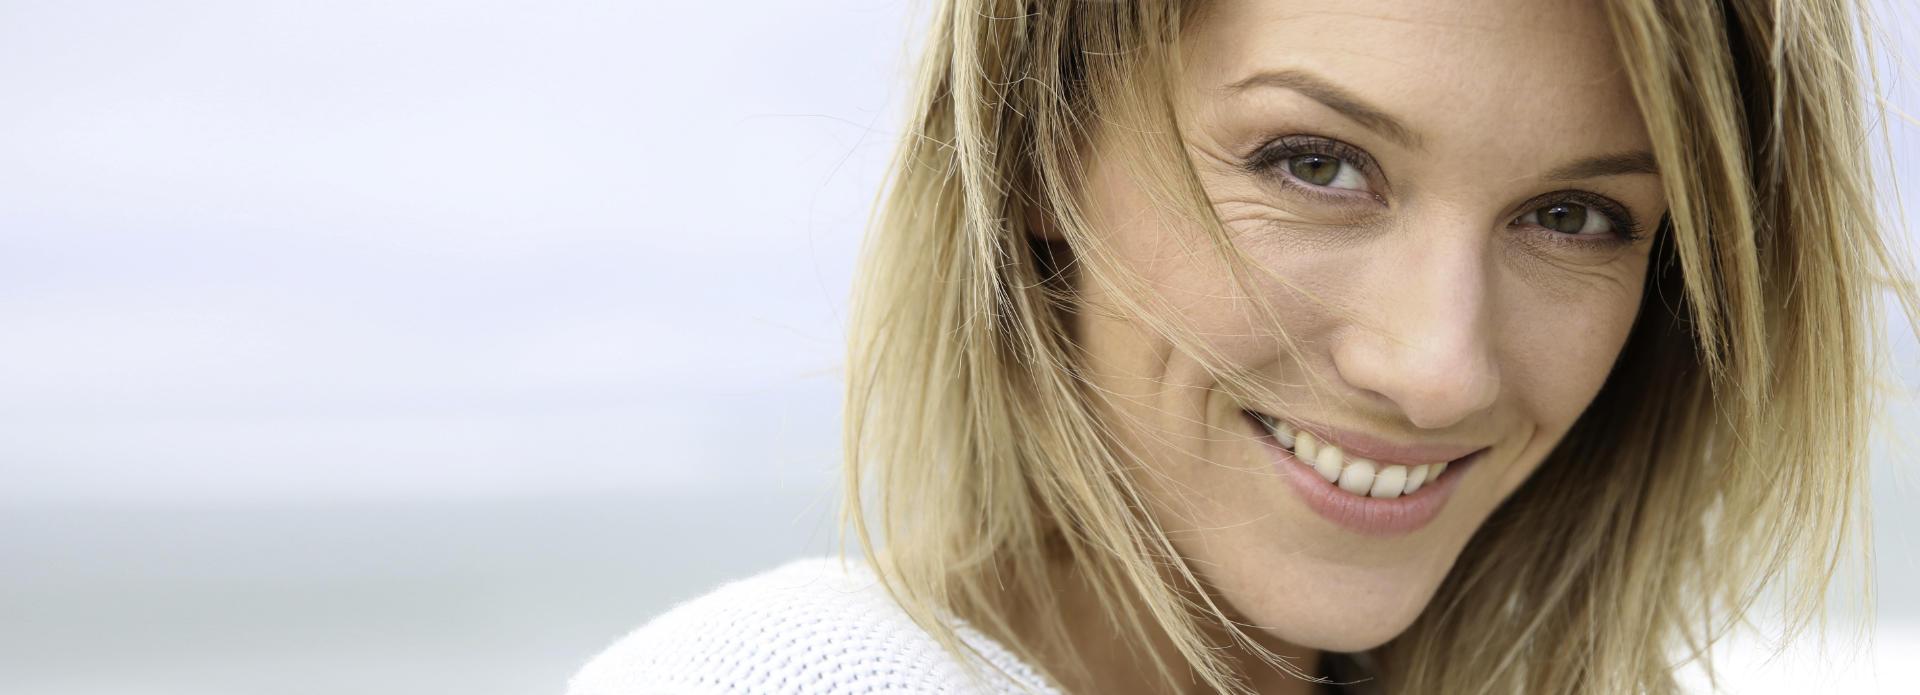 beautiful, calm, smiling blonde